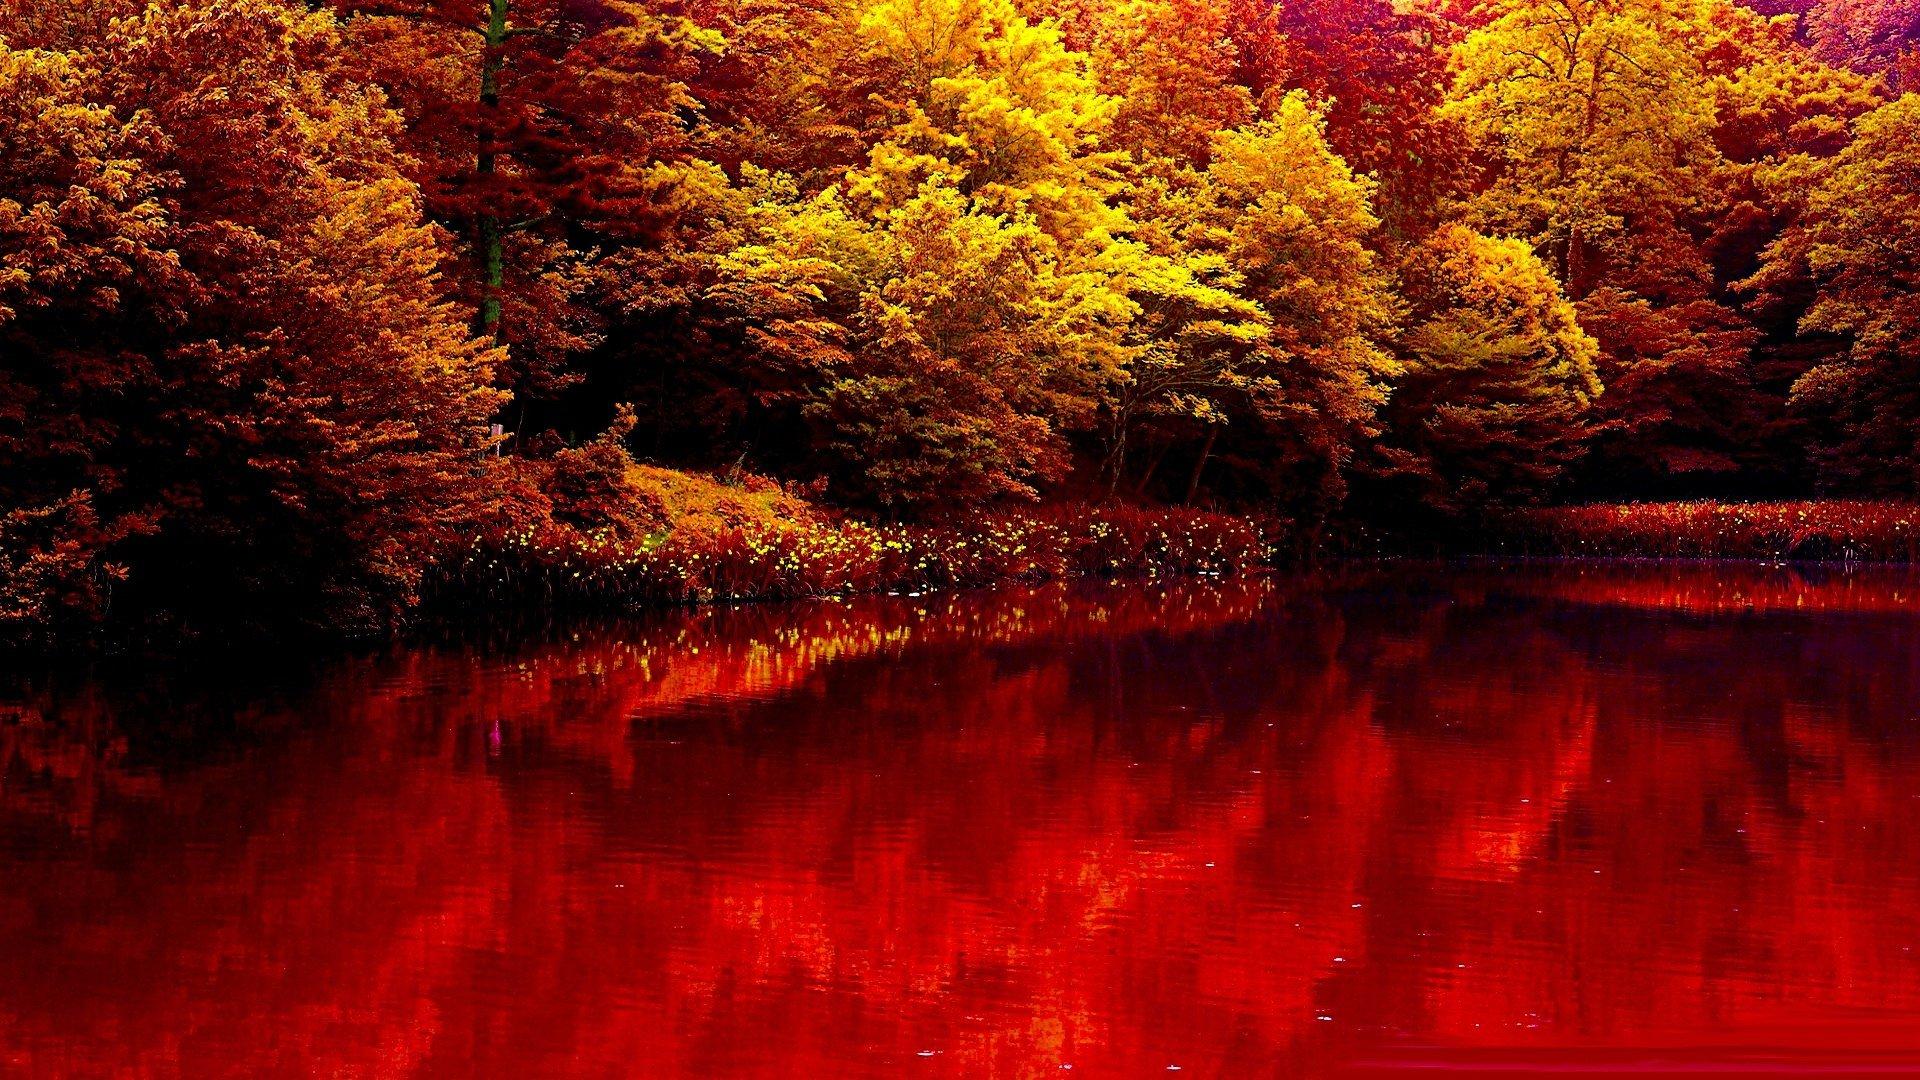 Free Fall Waterfall Desktop Wallpaper Nature Autumn Lake Forest Red Beauty Wallpaper 1920x1080